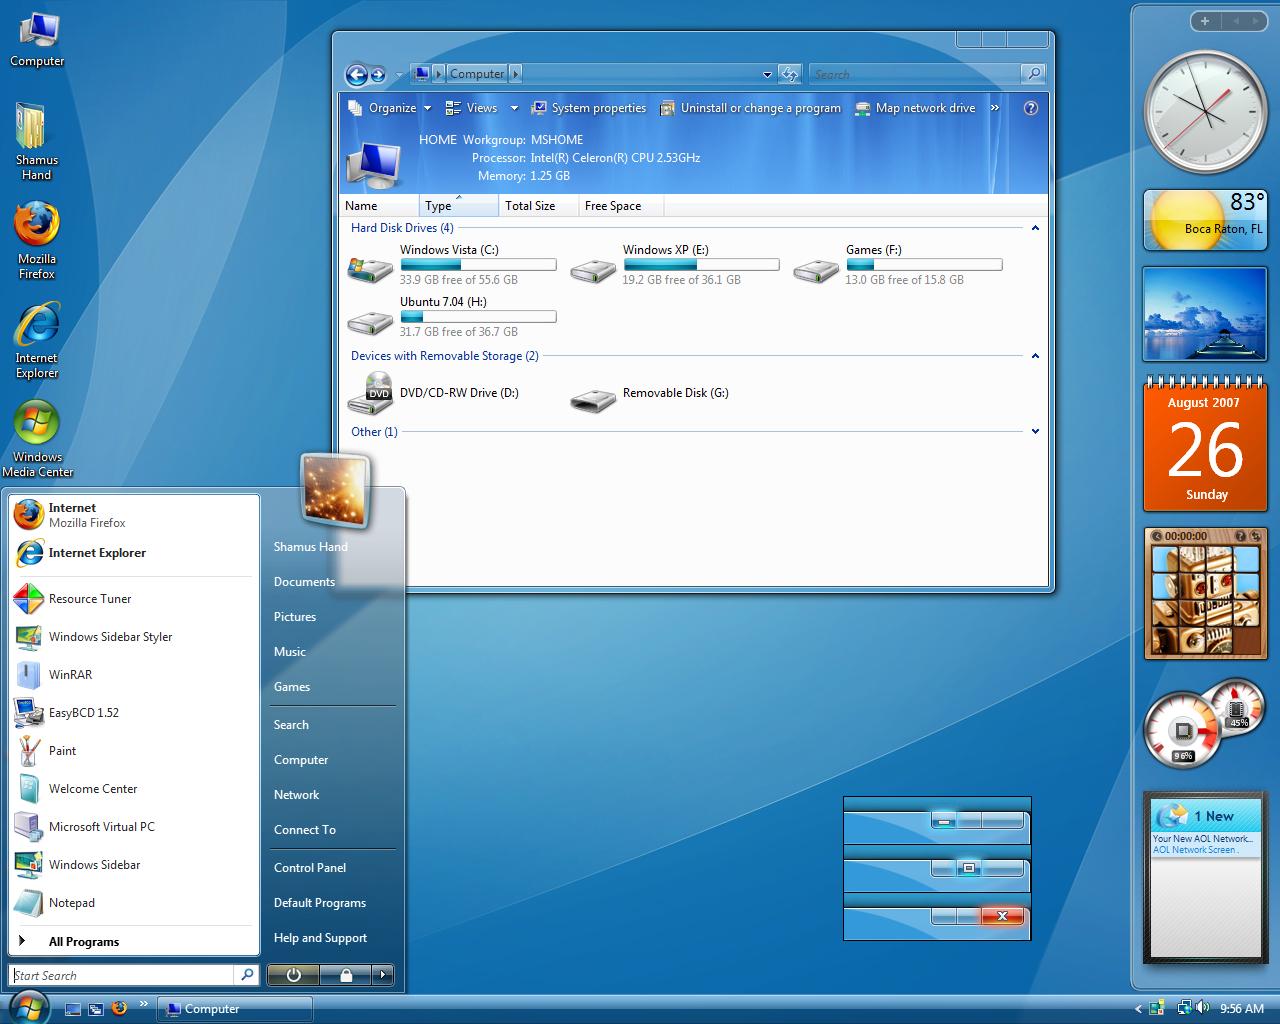 windows vista ultimate x64 sp1 iso